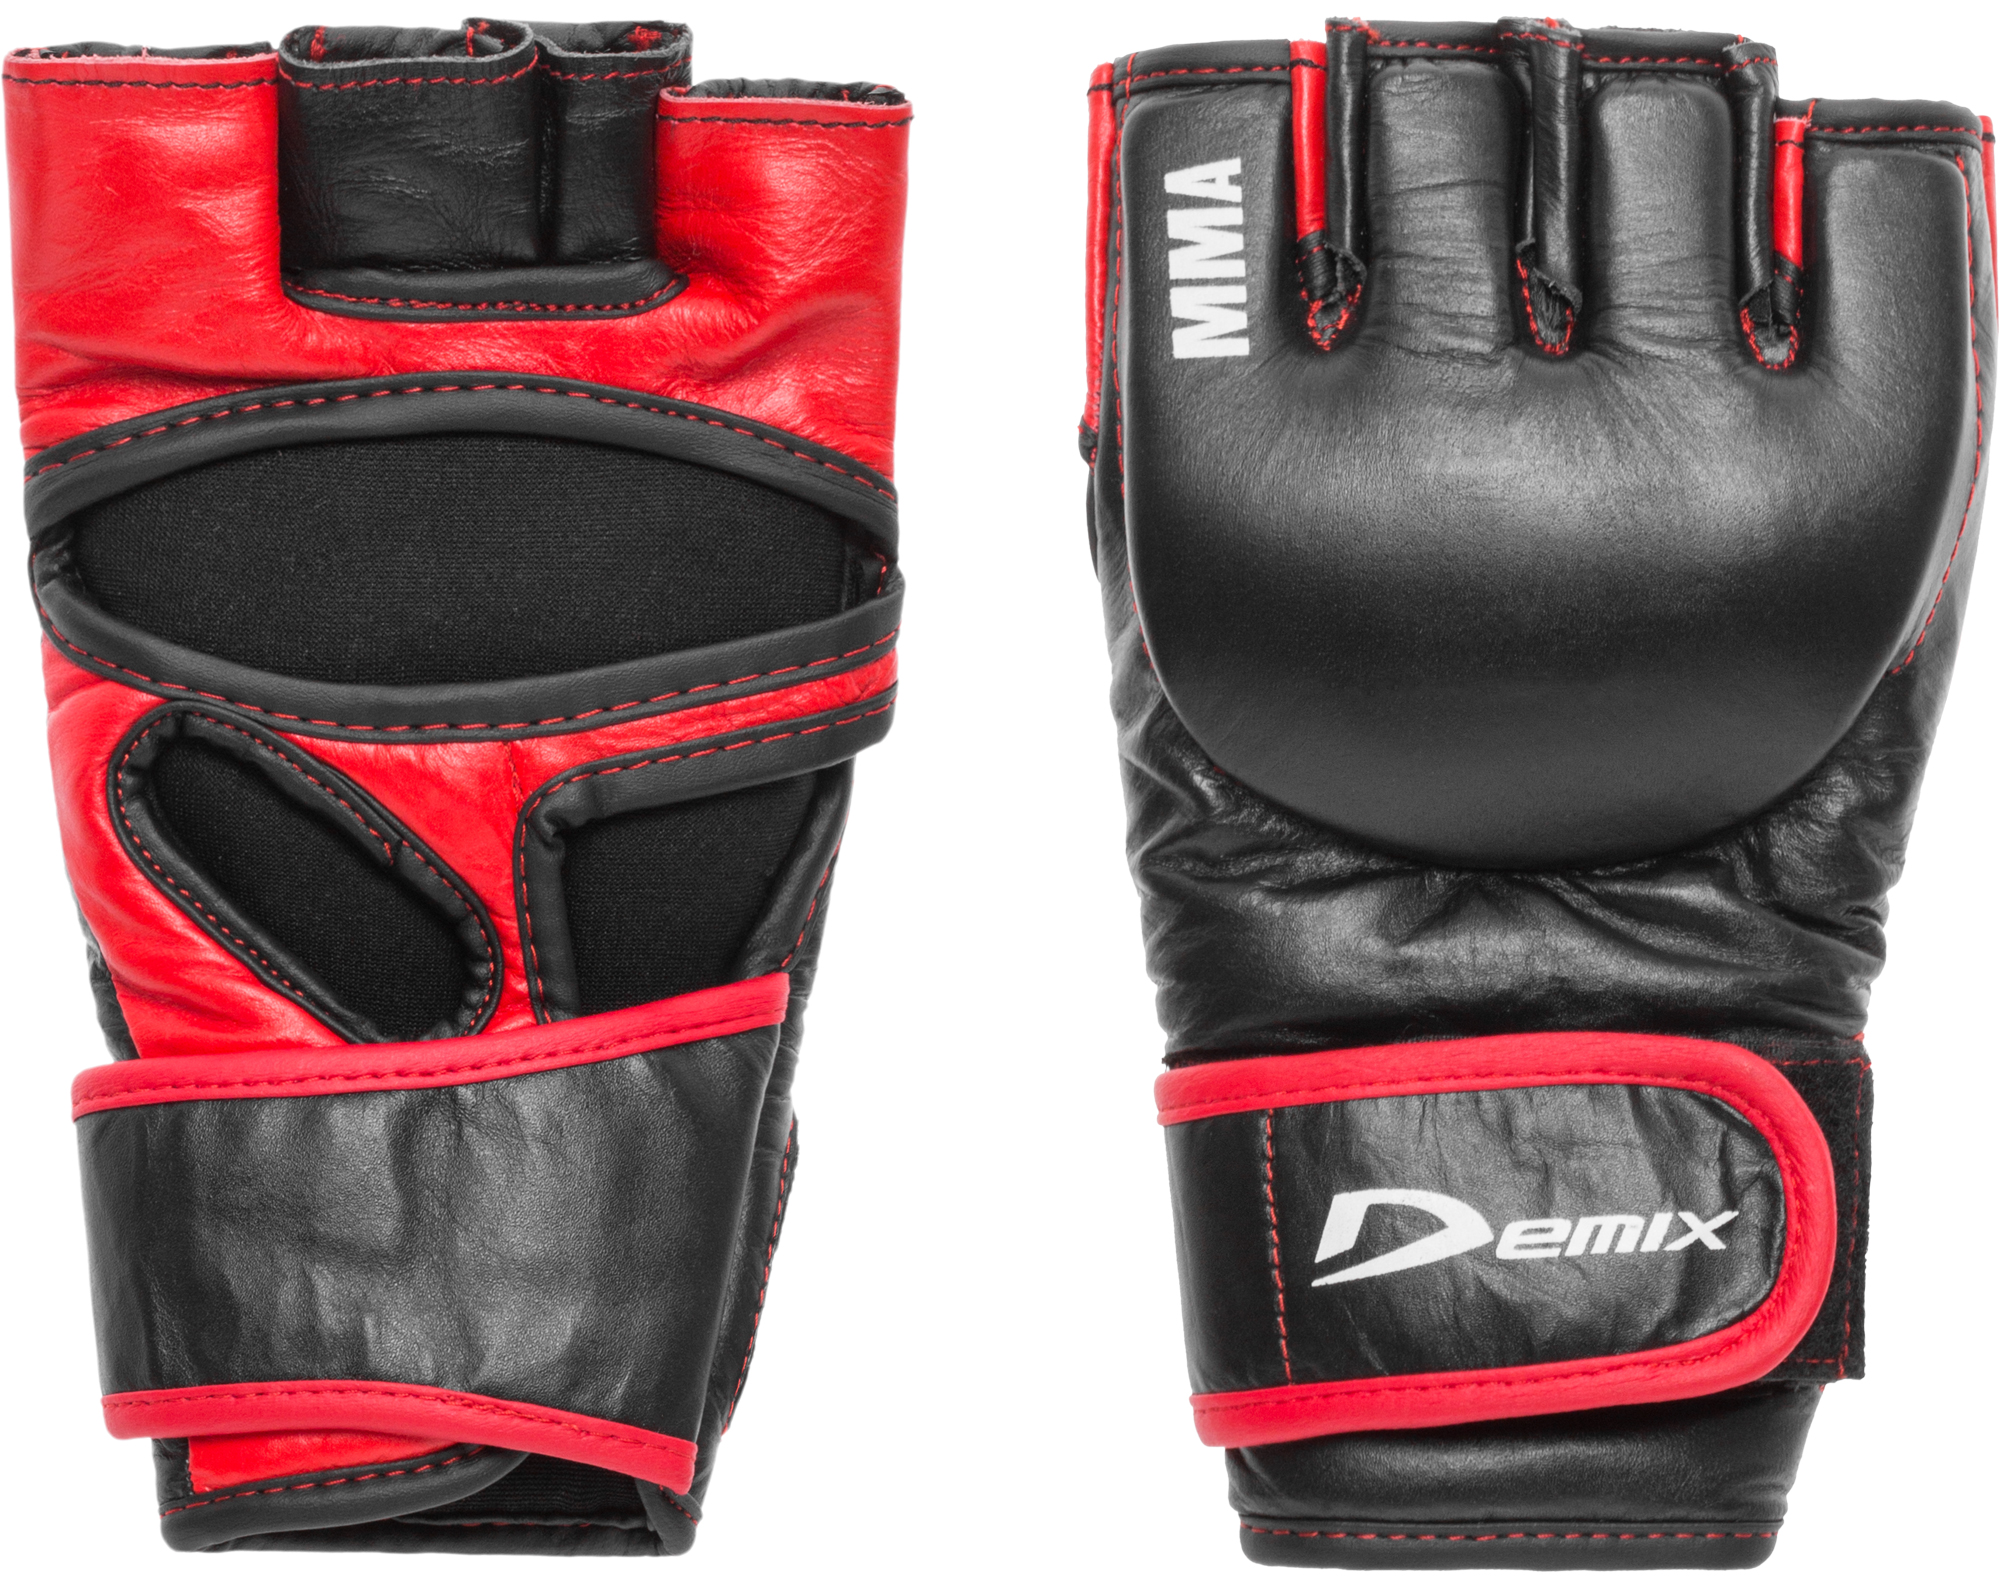 Demix Перчатки MMA Demix, размер L-XL перчатки спортивные reebok перчатки для mma glove xl